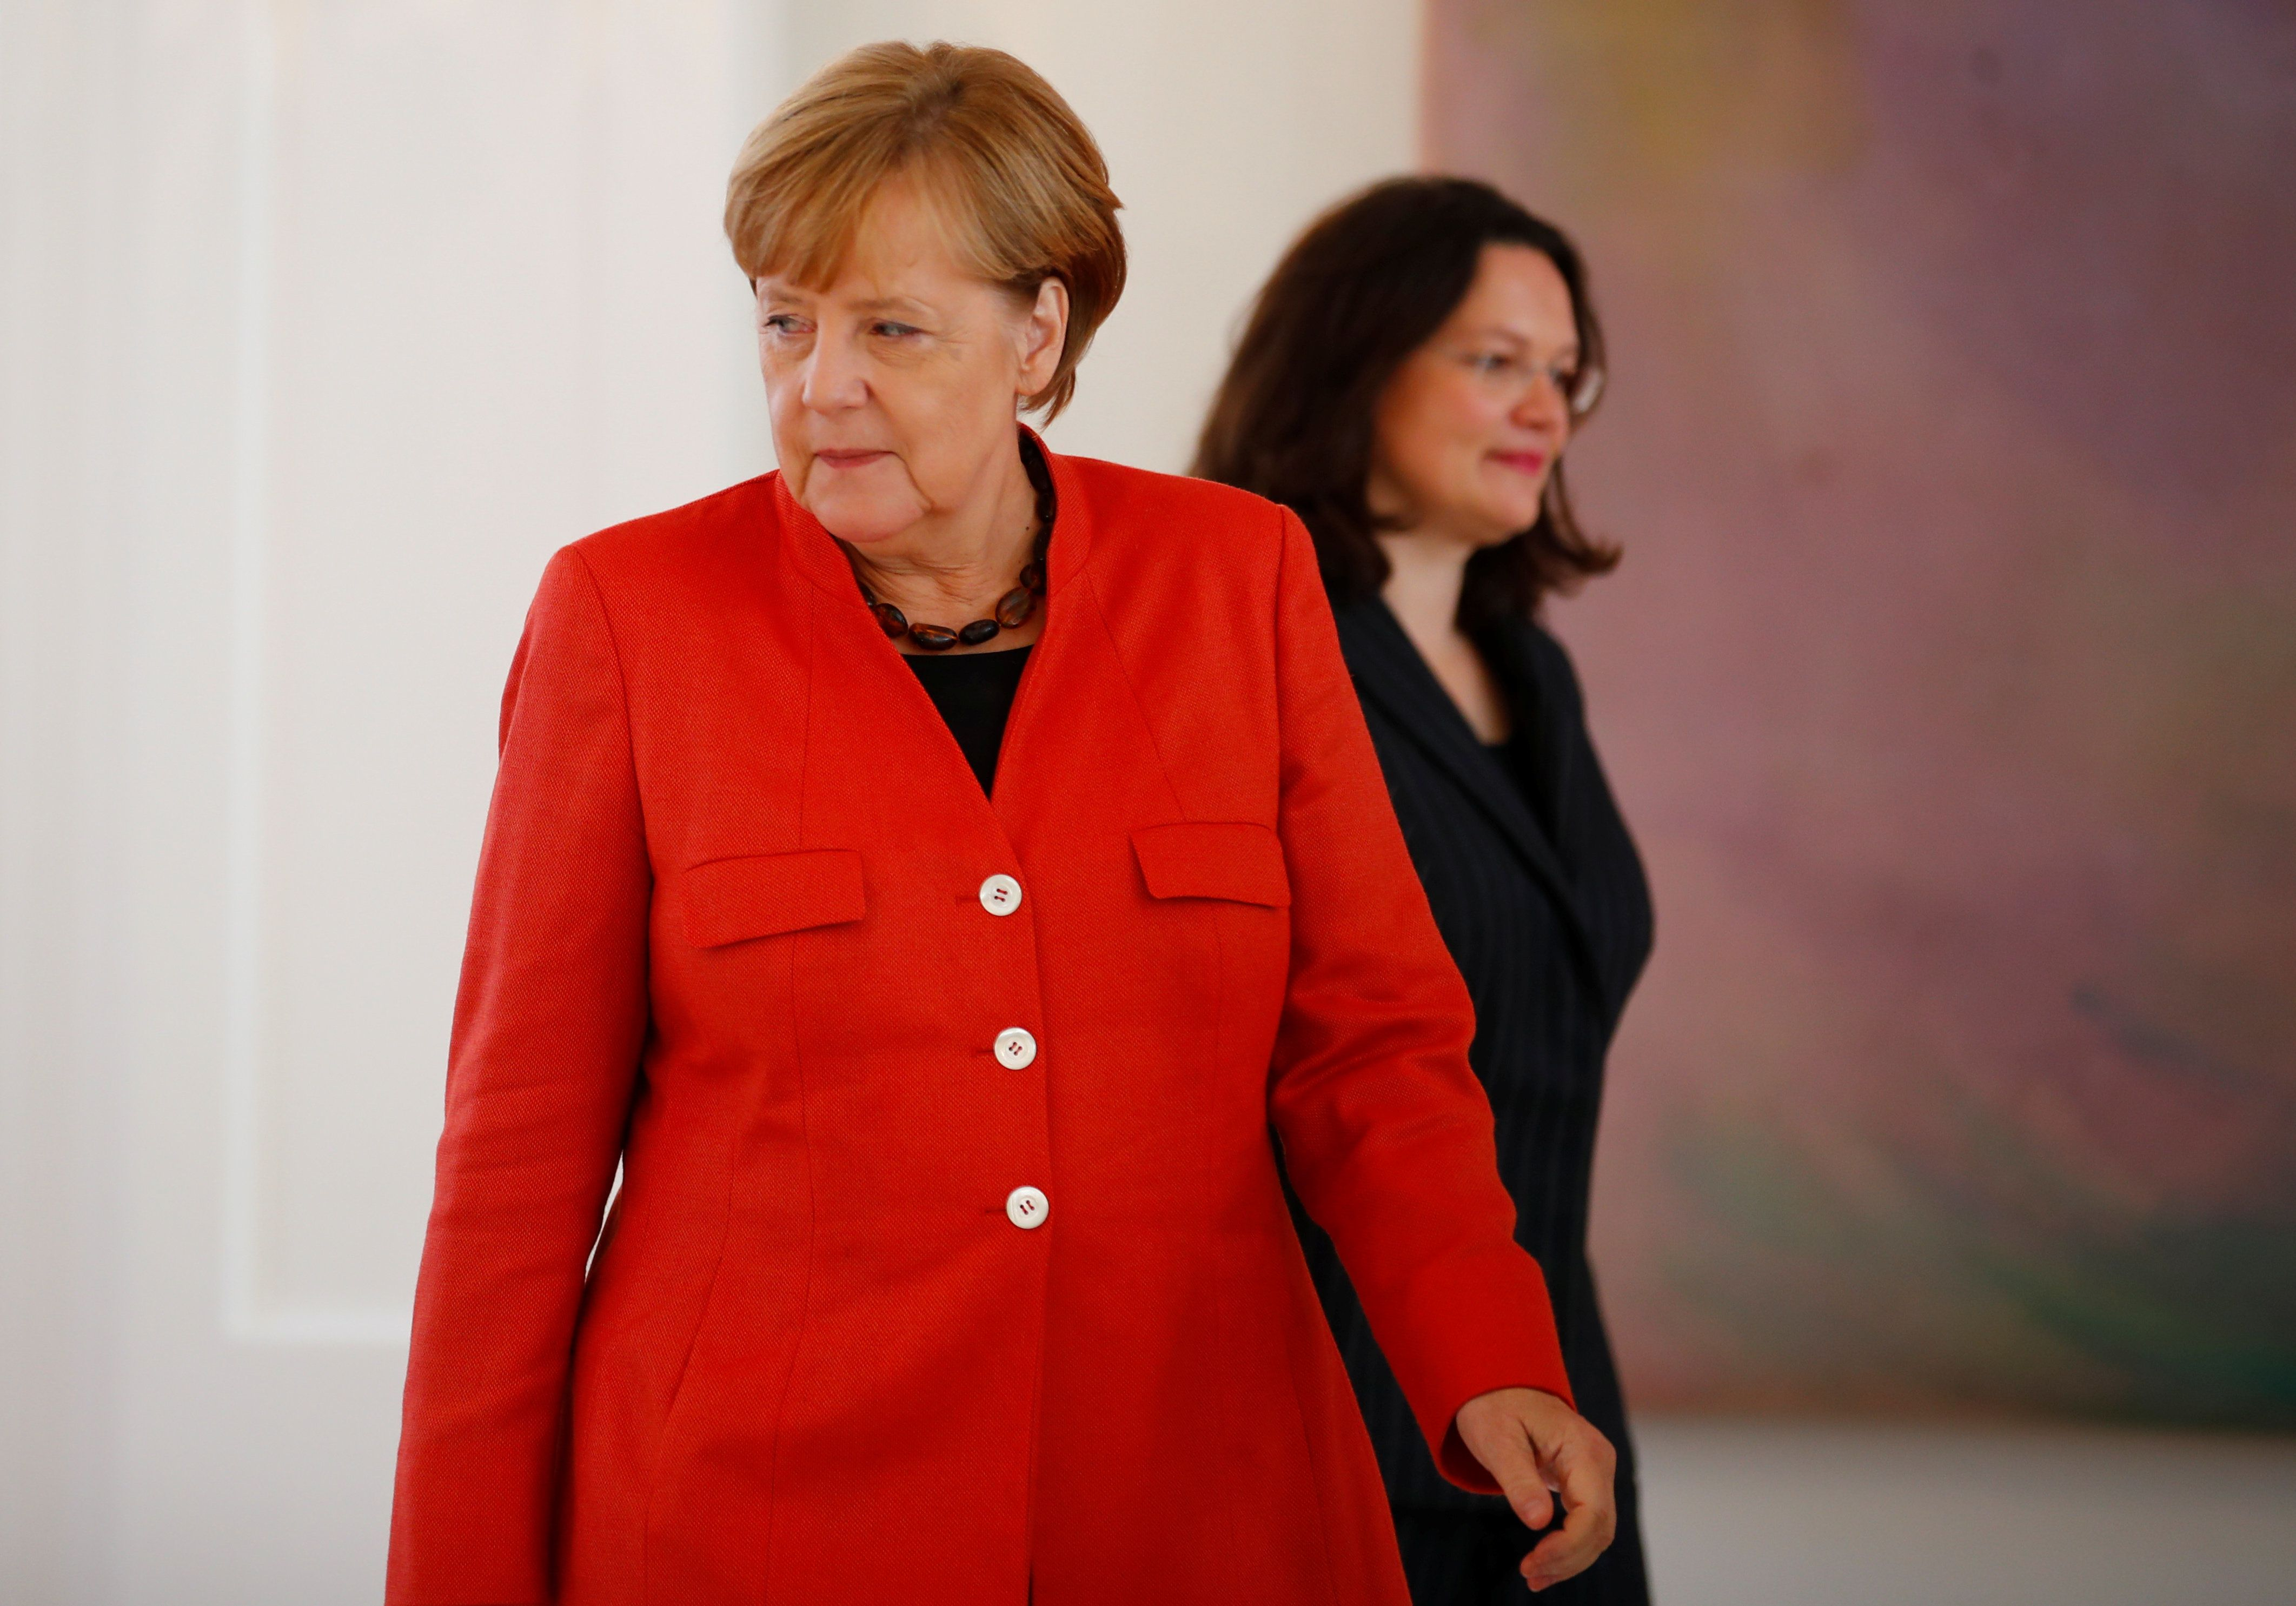 Kanzlerin Angela Merkel und SPD-Politikerin Andrea Nahles.